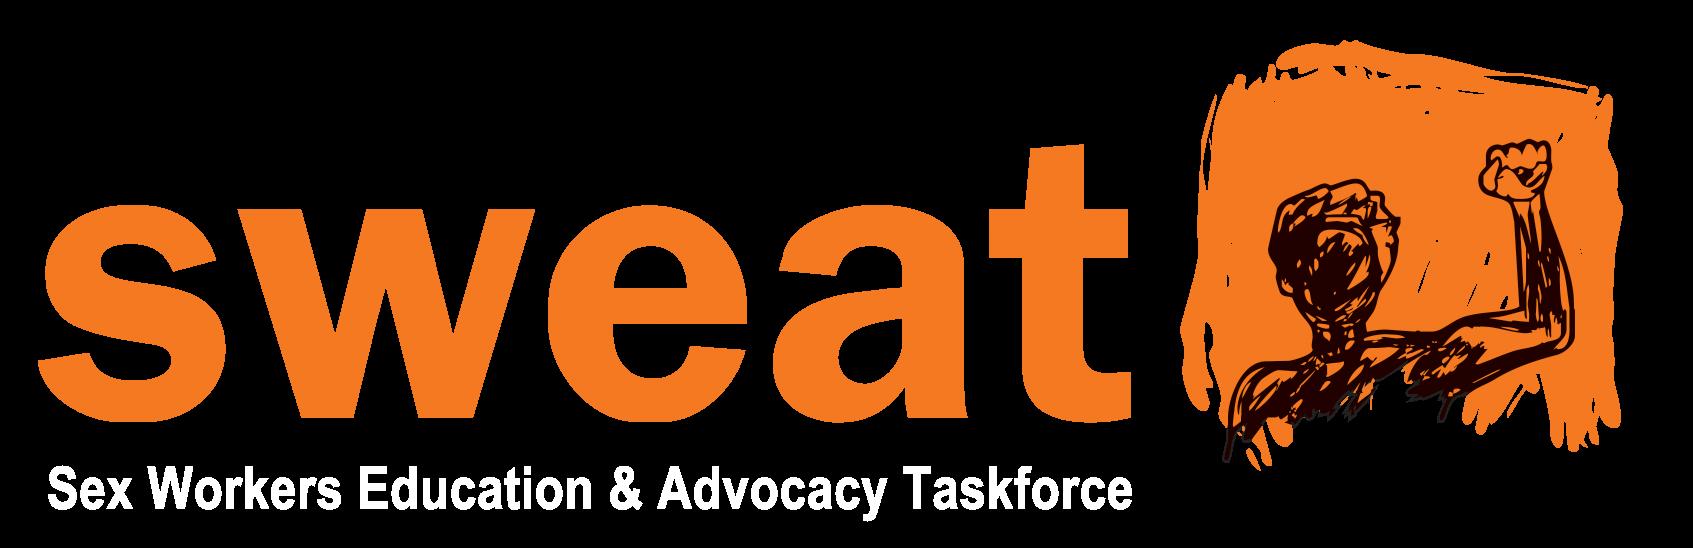 cropped-SWEAT-Logo-OPTION-2.png